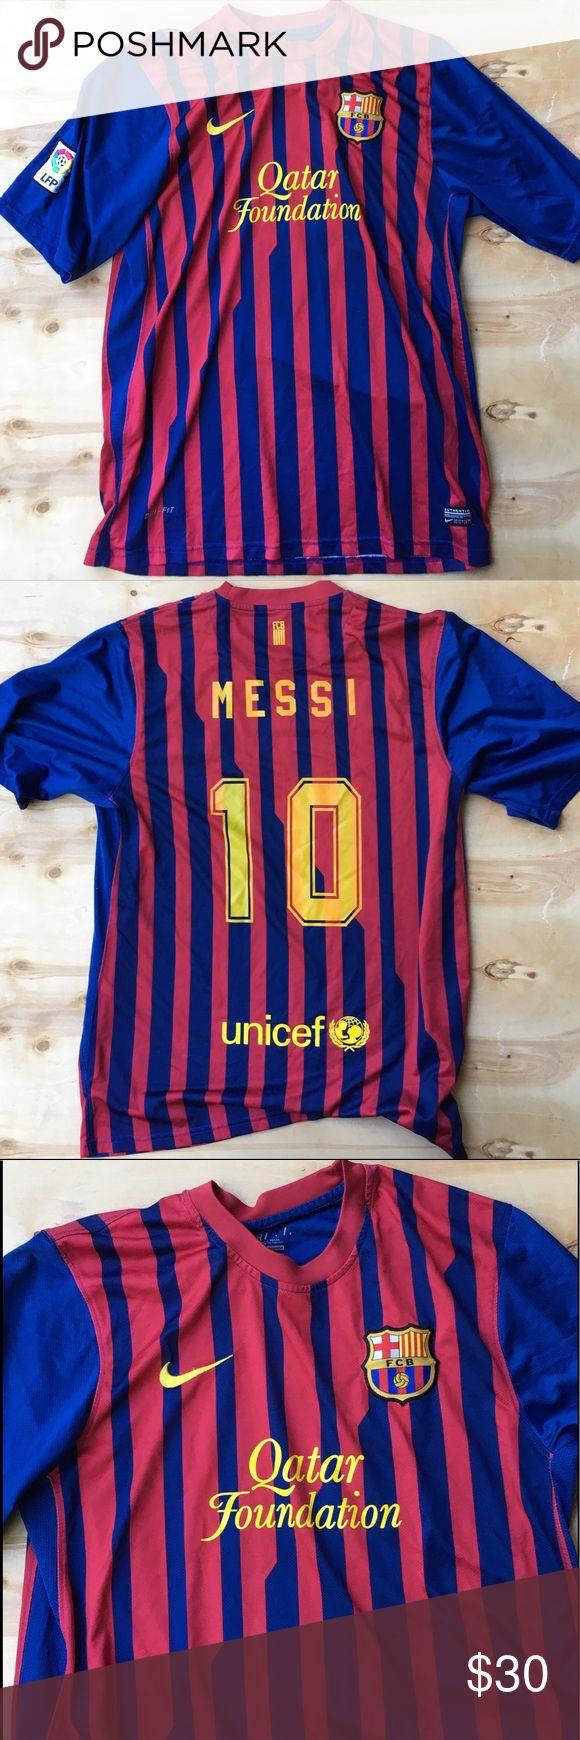 Barcelona Spain Messi soccer futbol jersey Nike XL Home game jersey XL original Nike 7/10 cond Nike Shirts